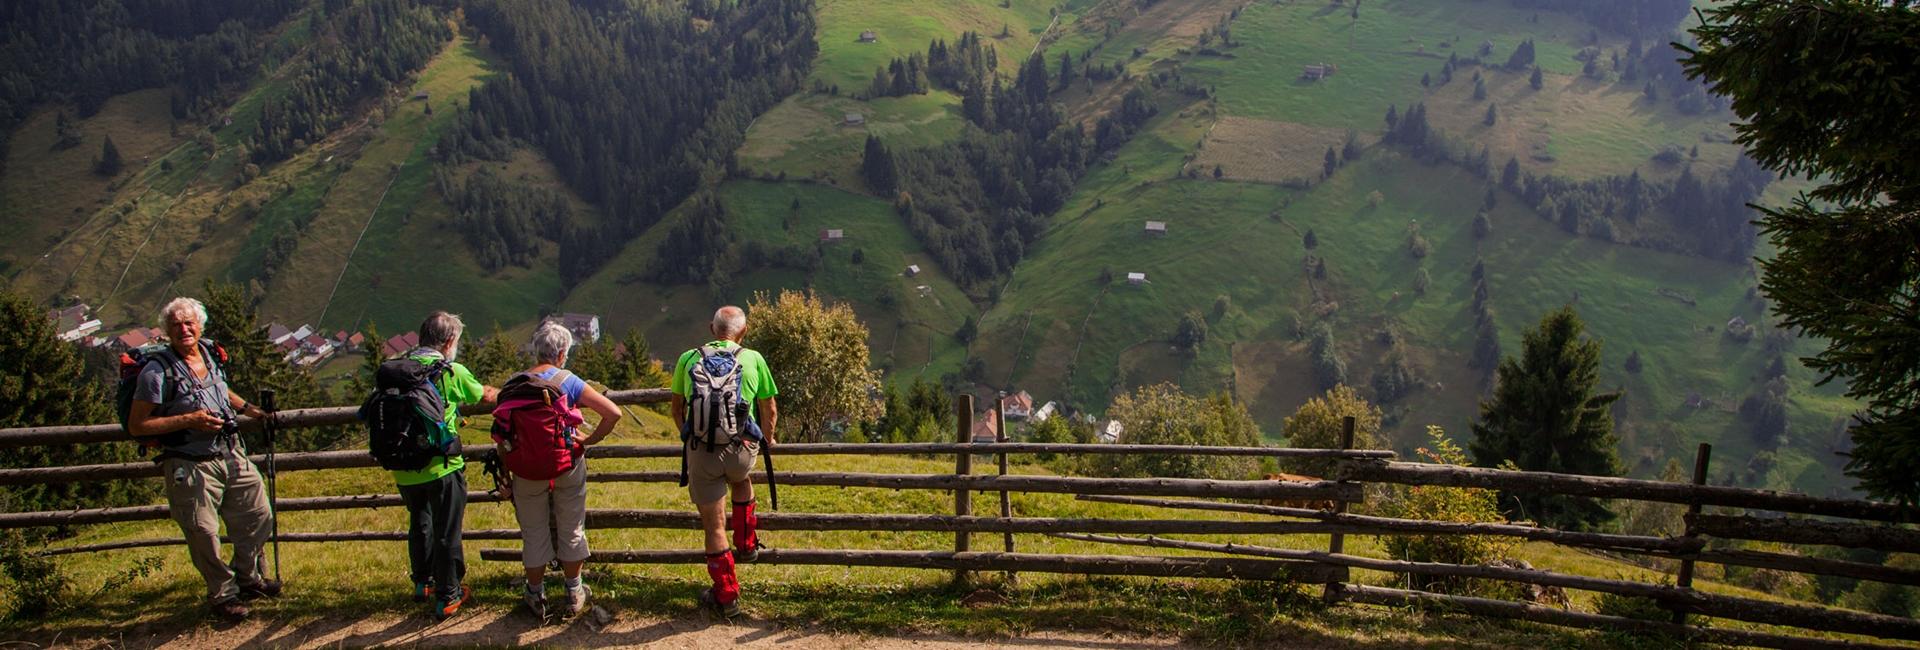 Drumeții montane prin Piatra Craiului & Bucegi